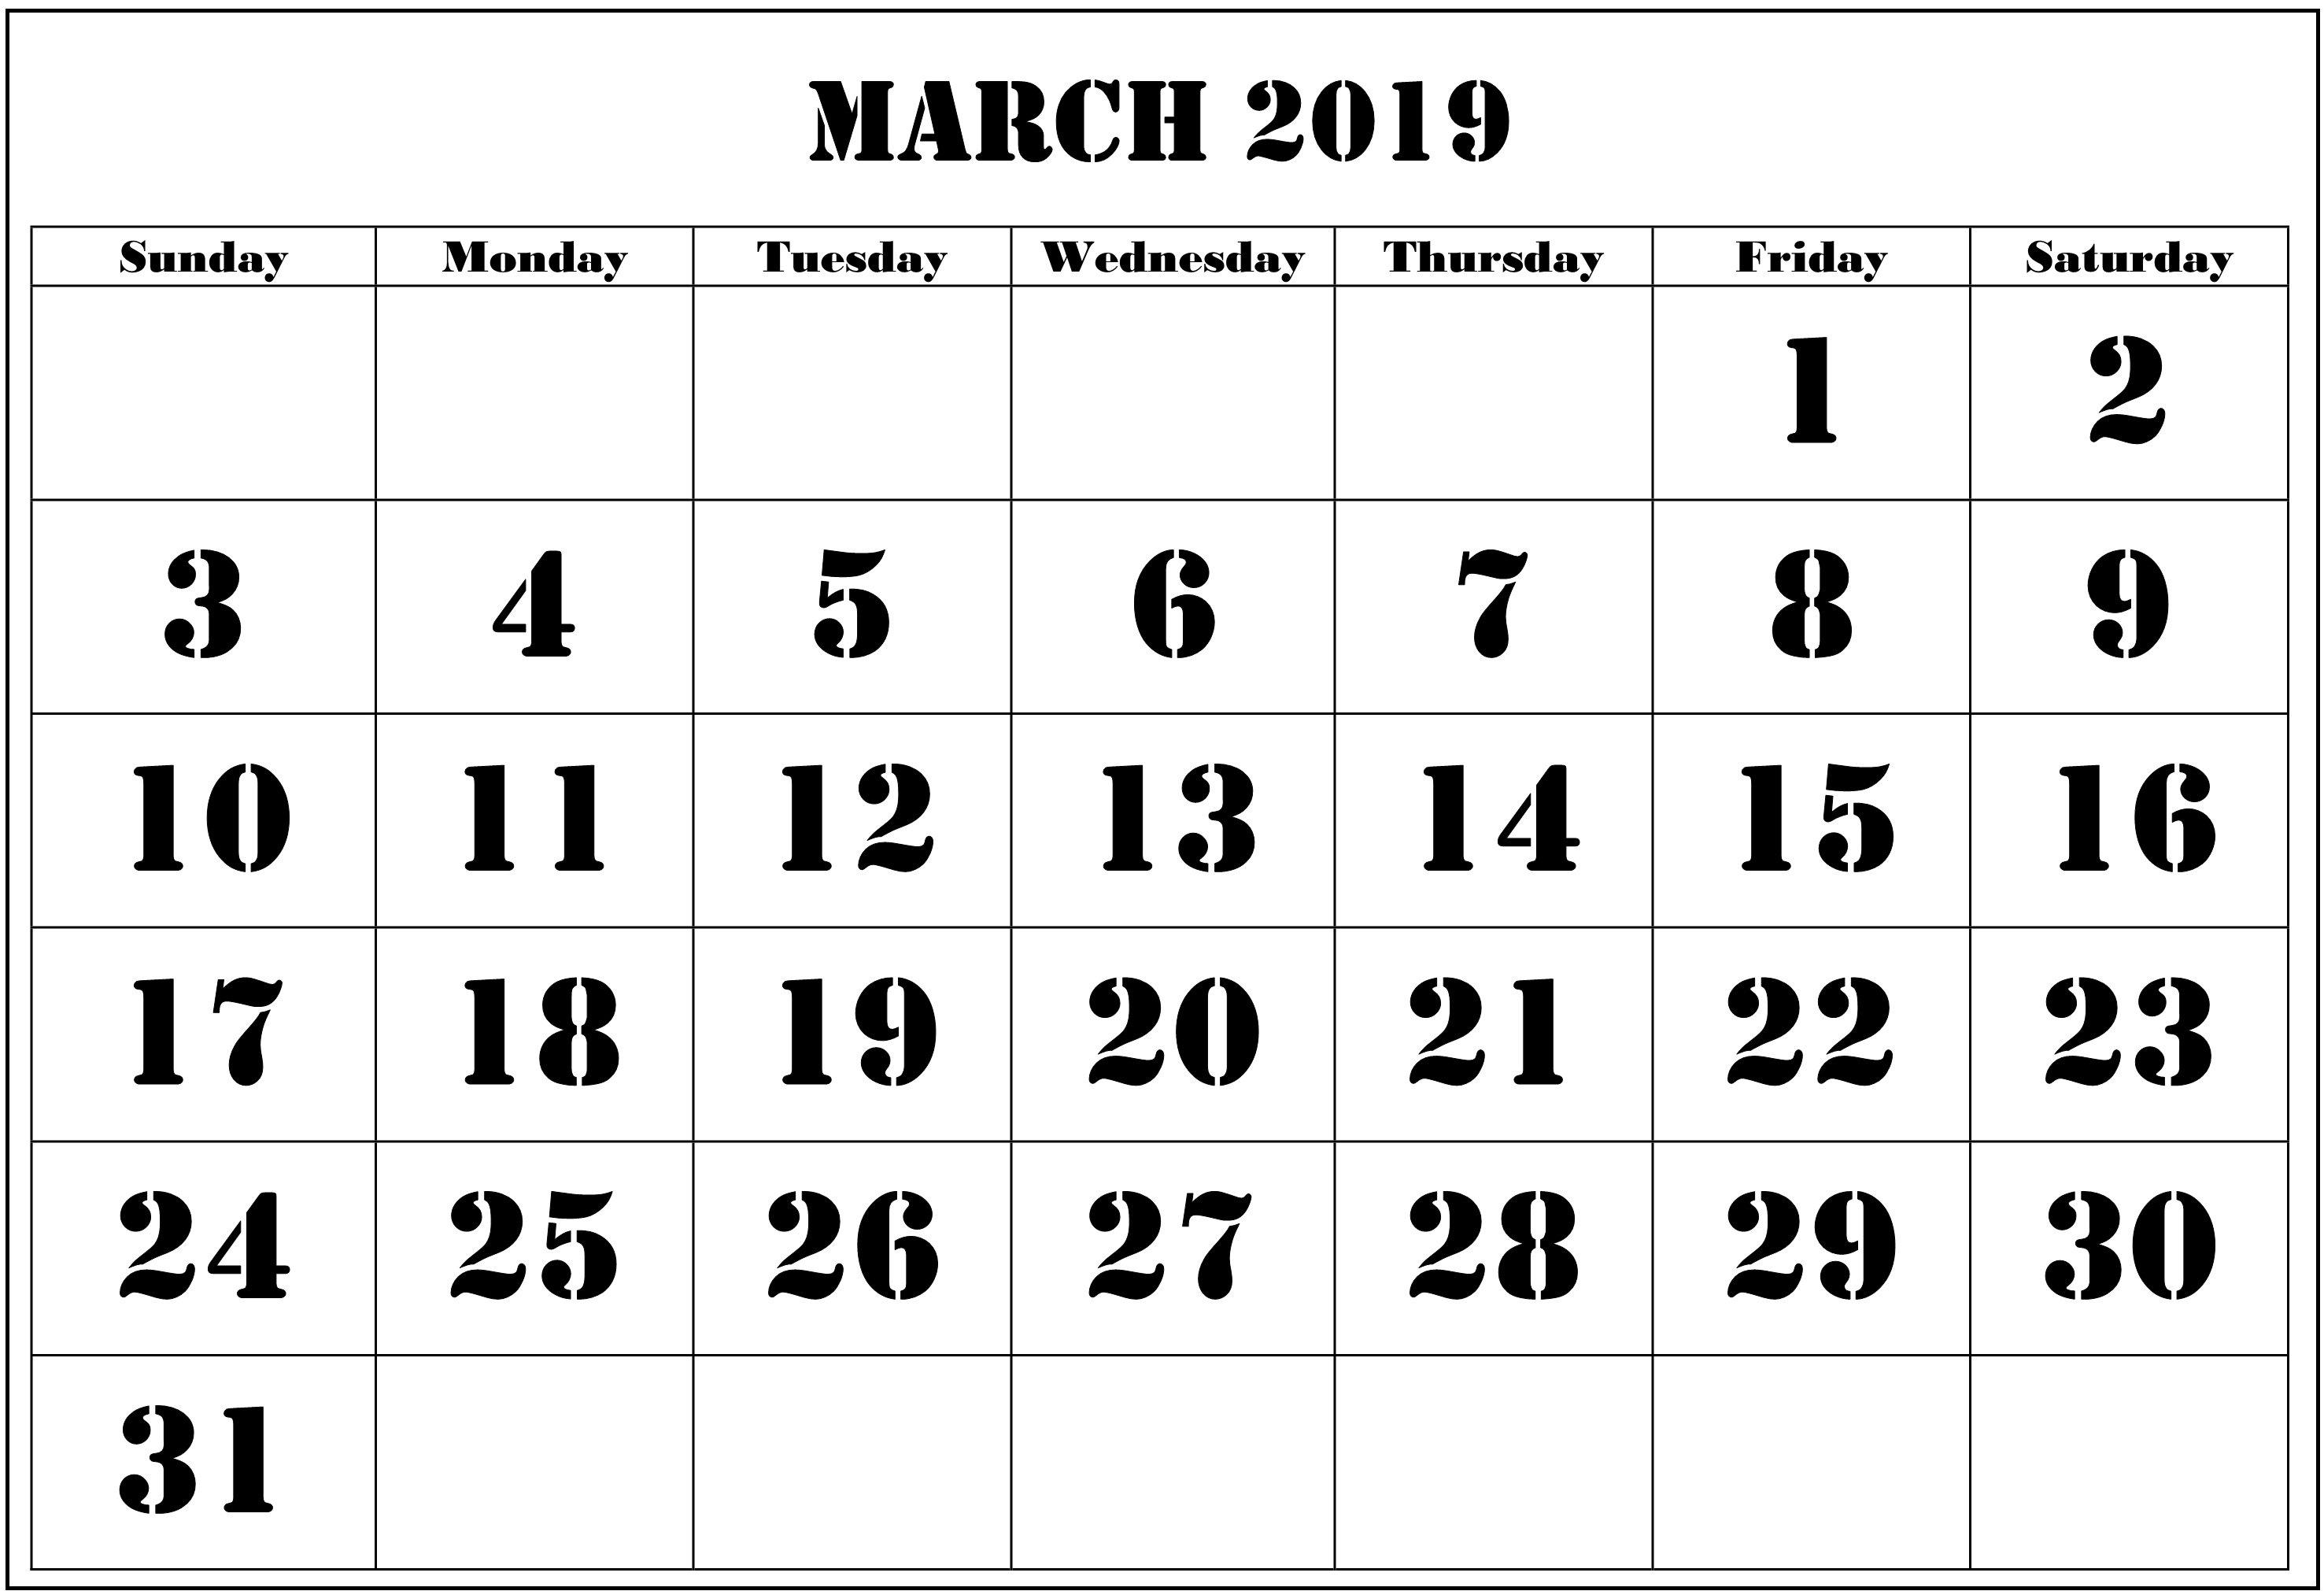 Blank Calendar March 2019 - Free August 2019 Calendar Printable March 8 2019 Calendar